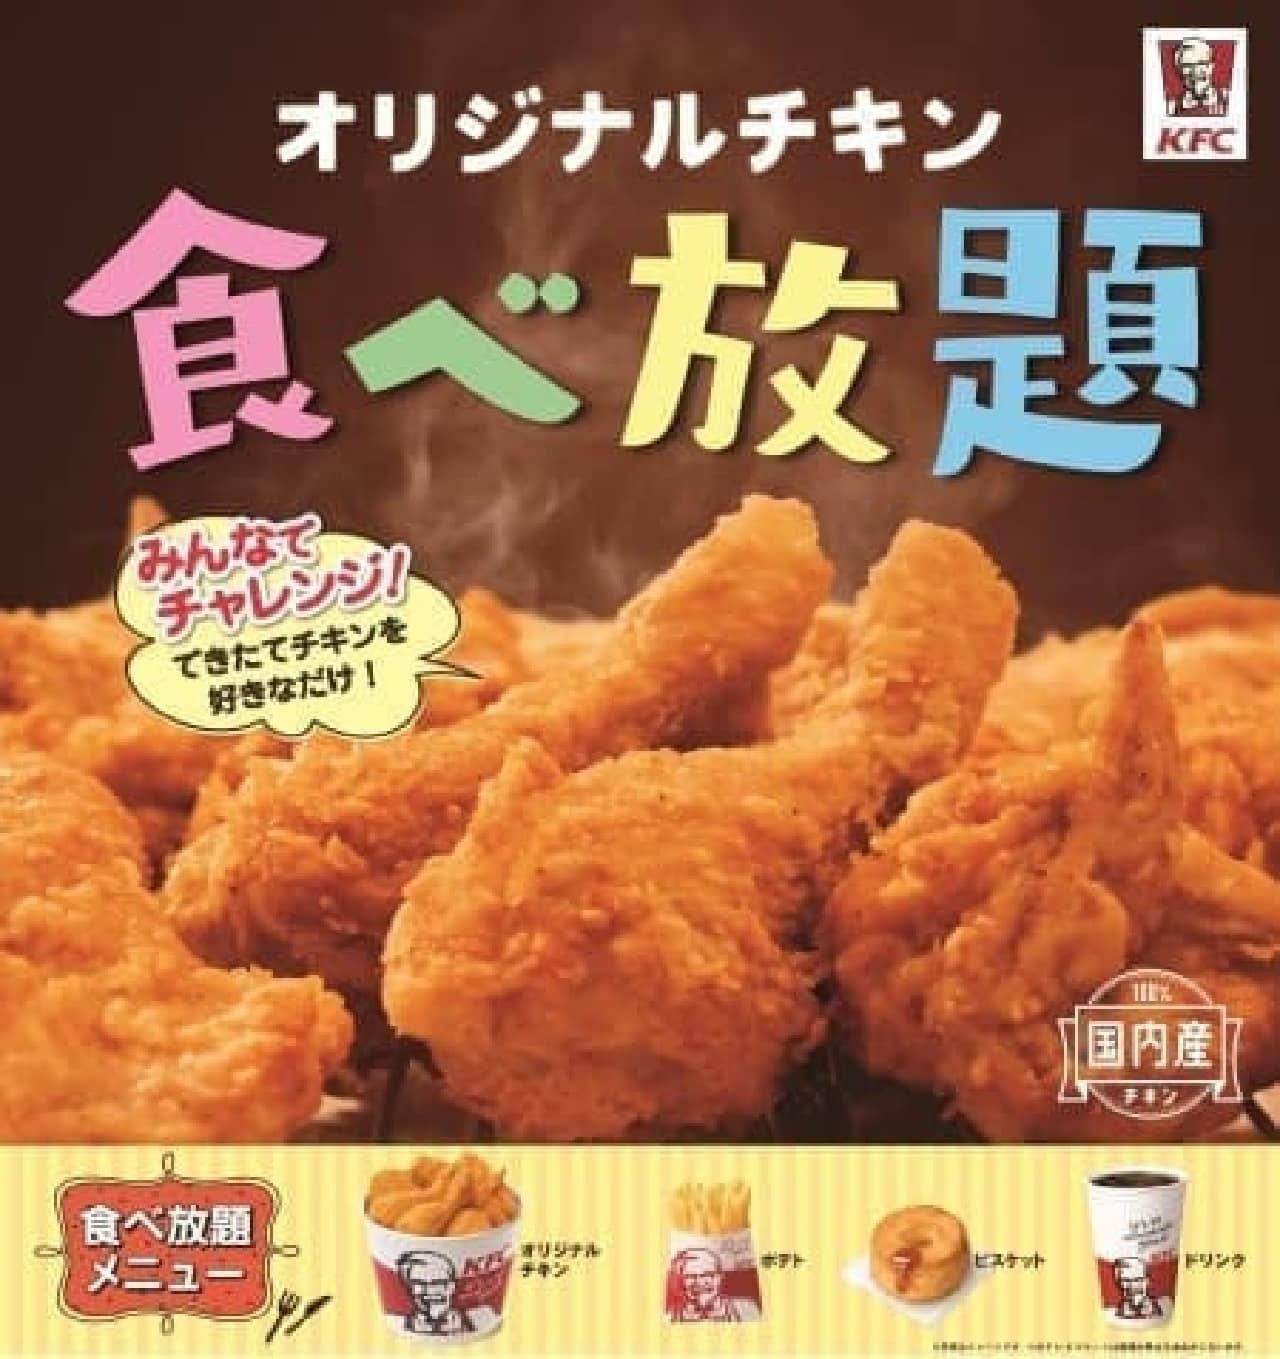 KFC「『オリジナルチキン』食べ放題」